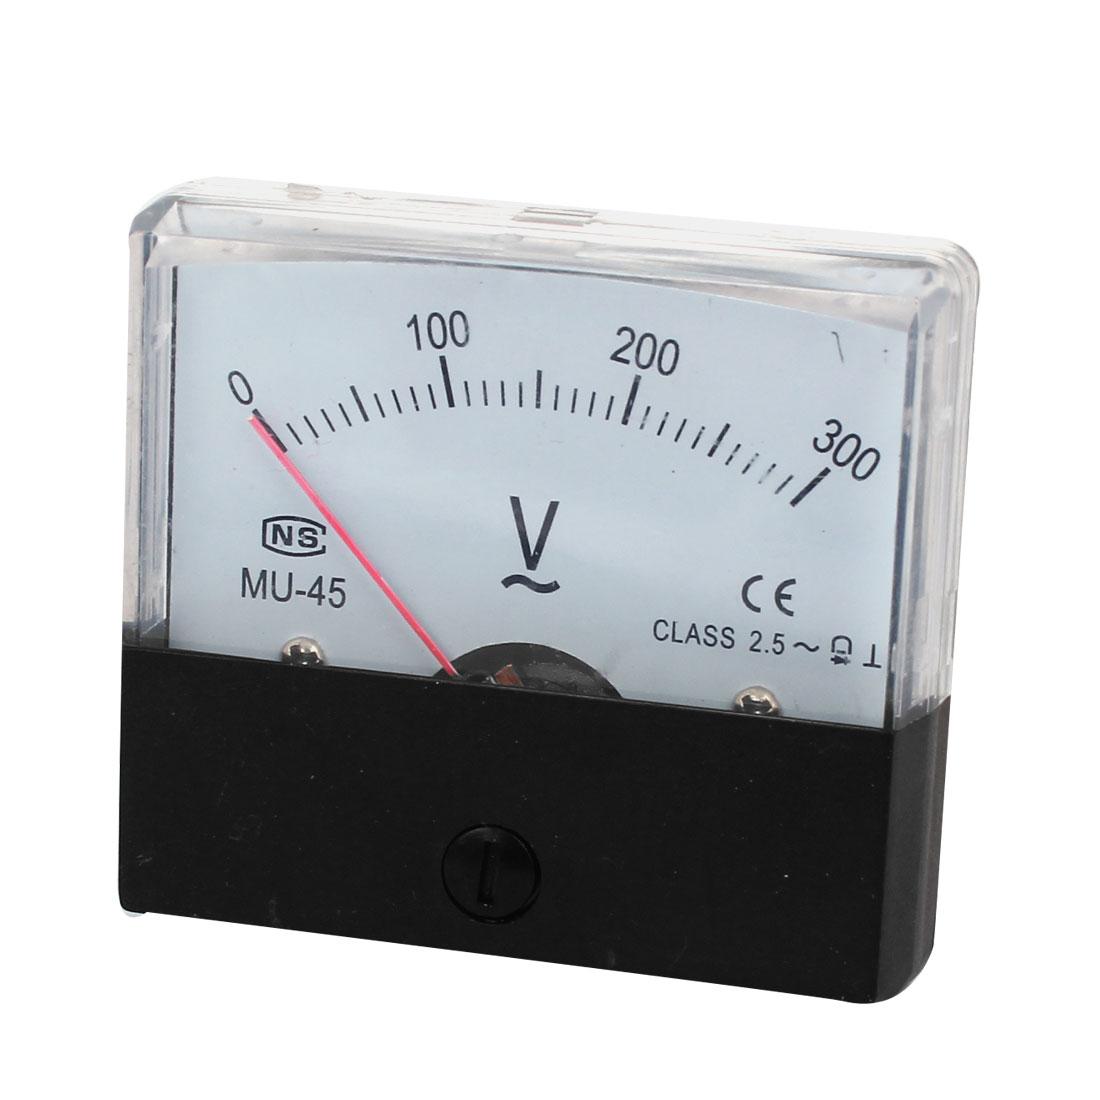 MU-45 Fine Tuning Dial Analog Volt Panel Meter Gauge AC 0-300V